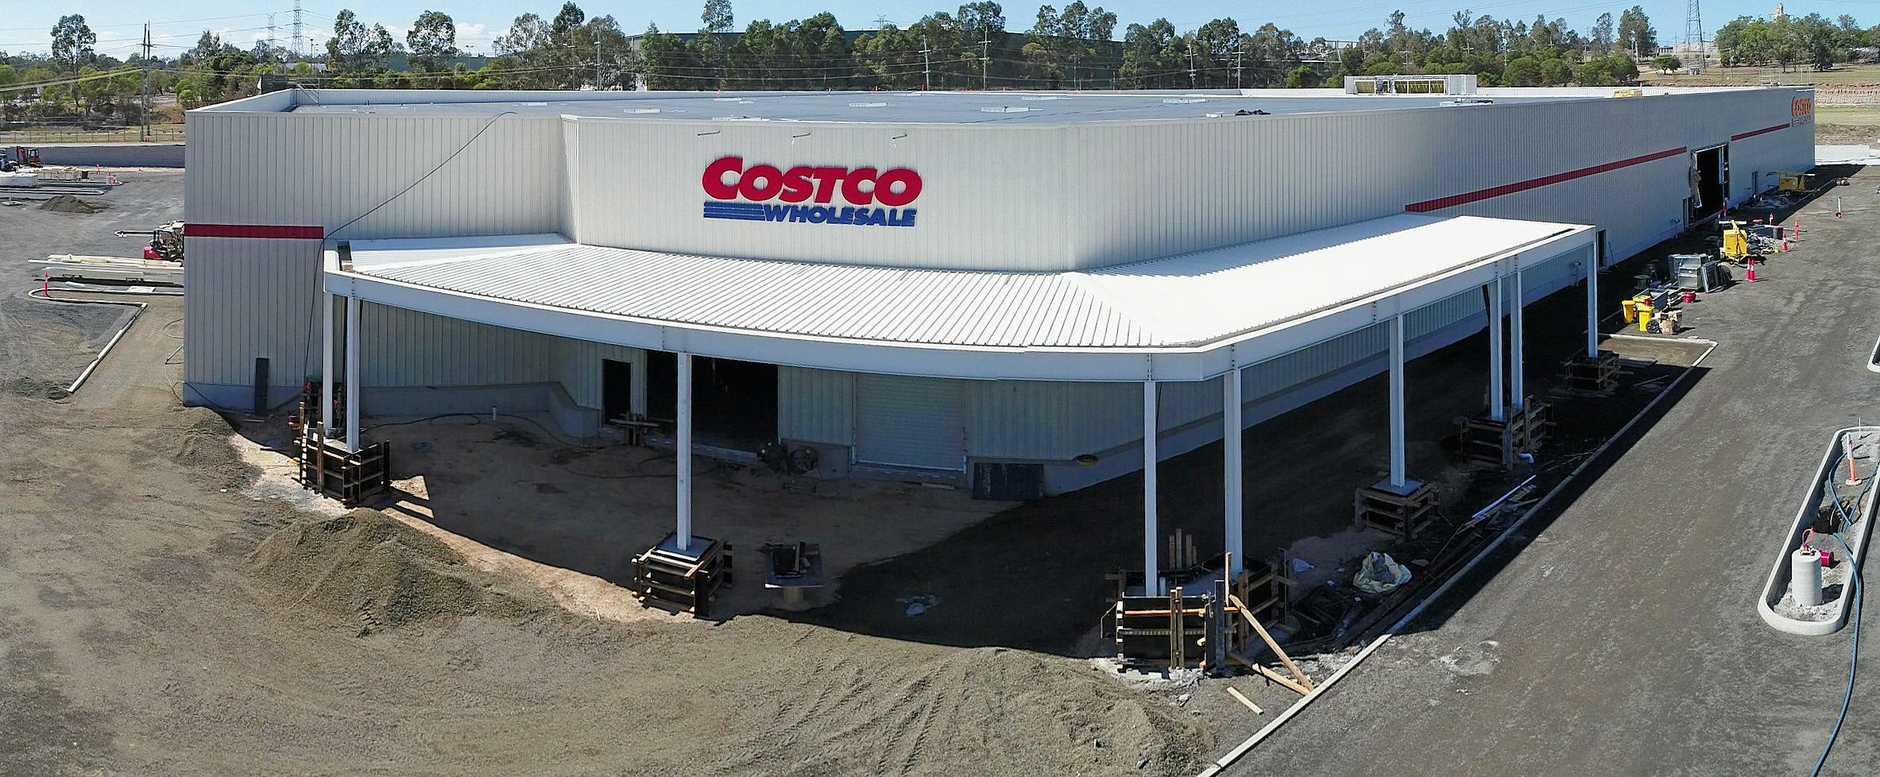 Costco at Bundamba on October 1, 2018.